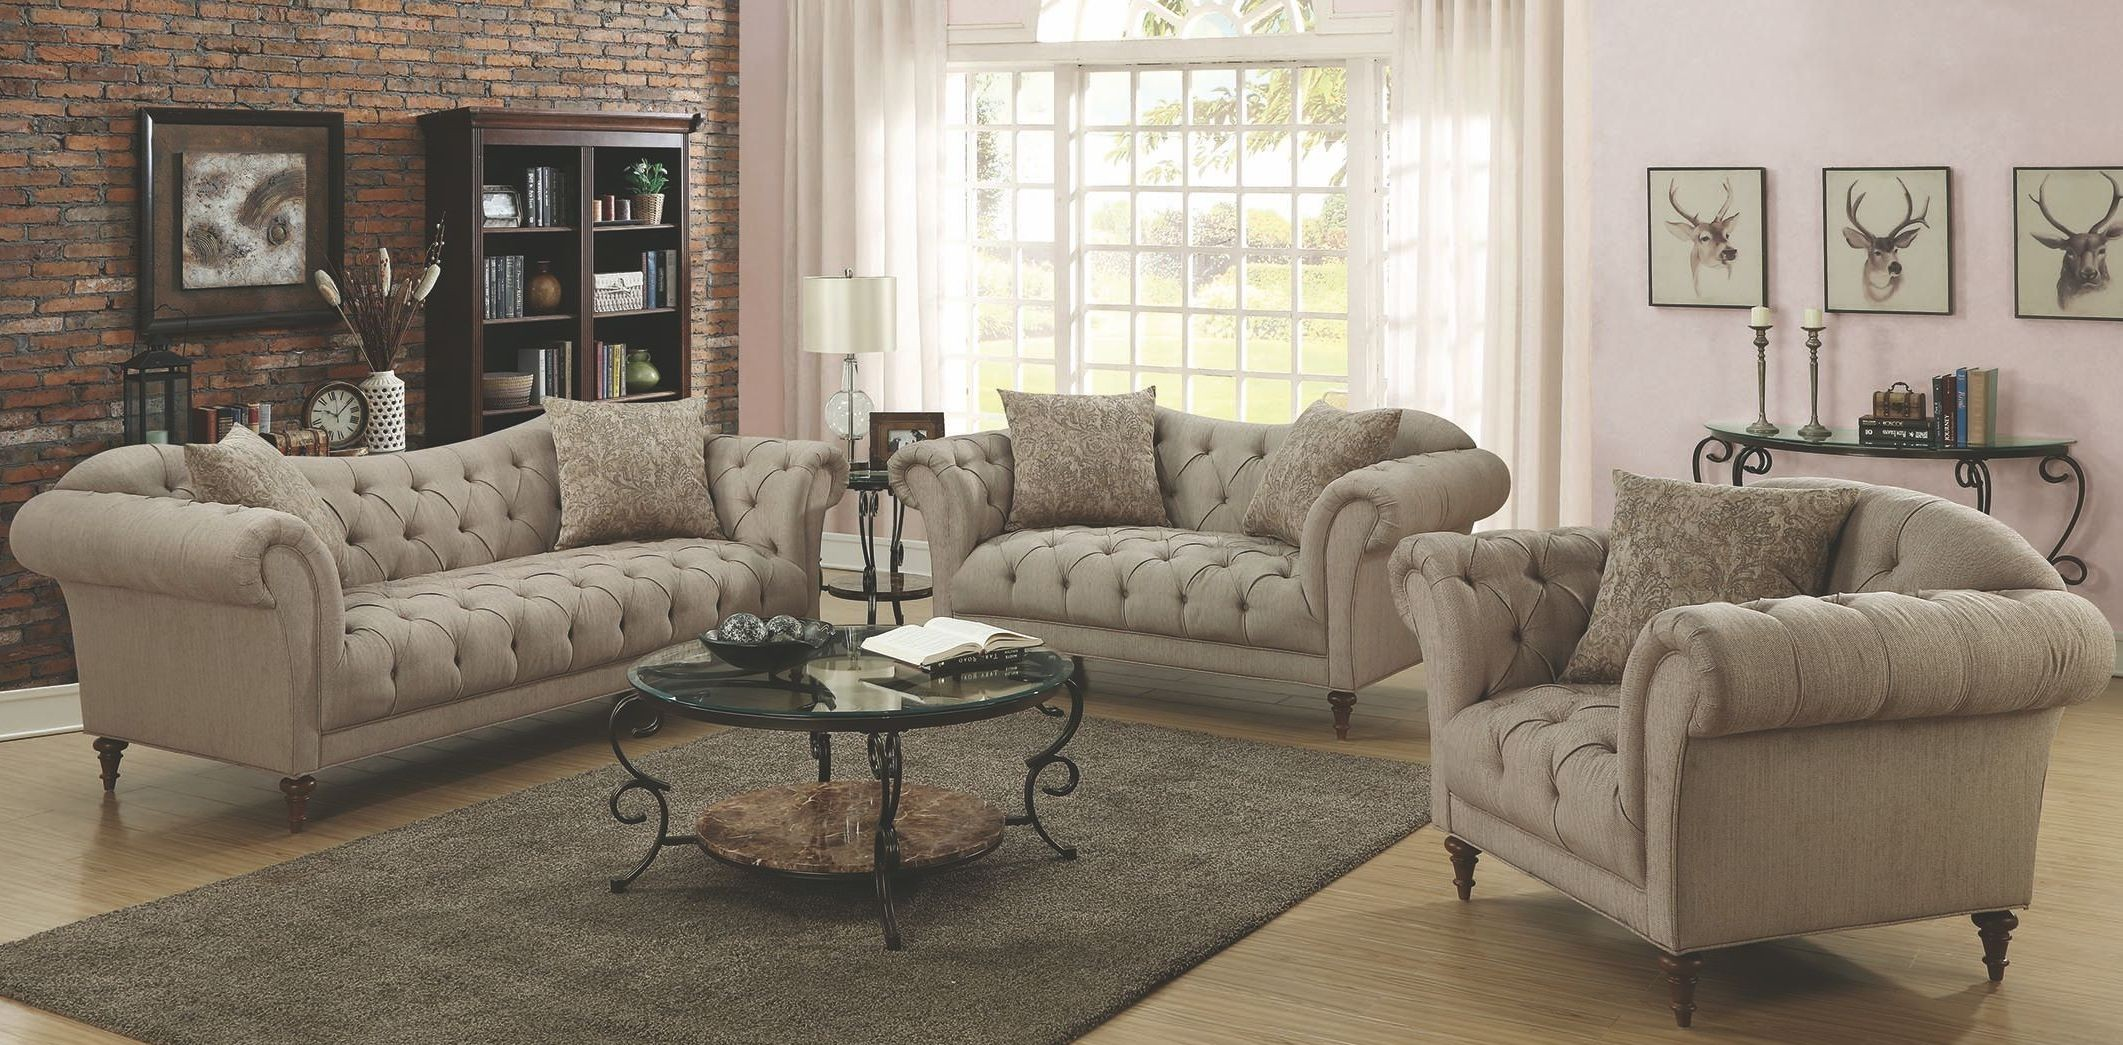 Alasdair light brown living room set 505571 coaster for Light brown living room